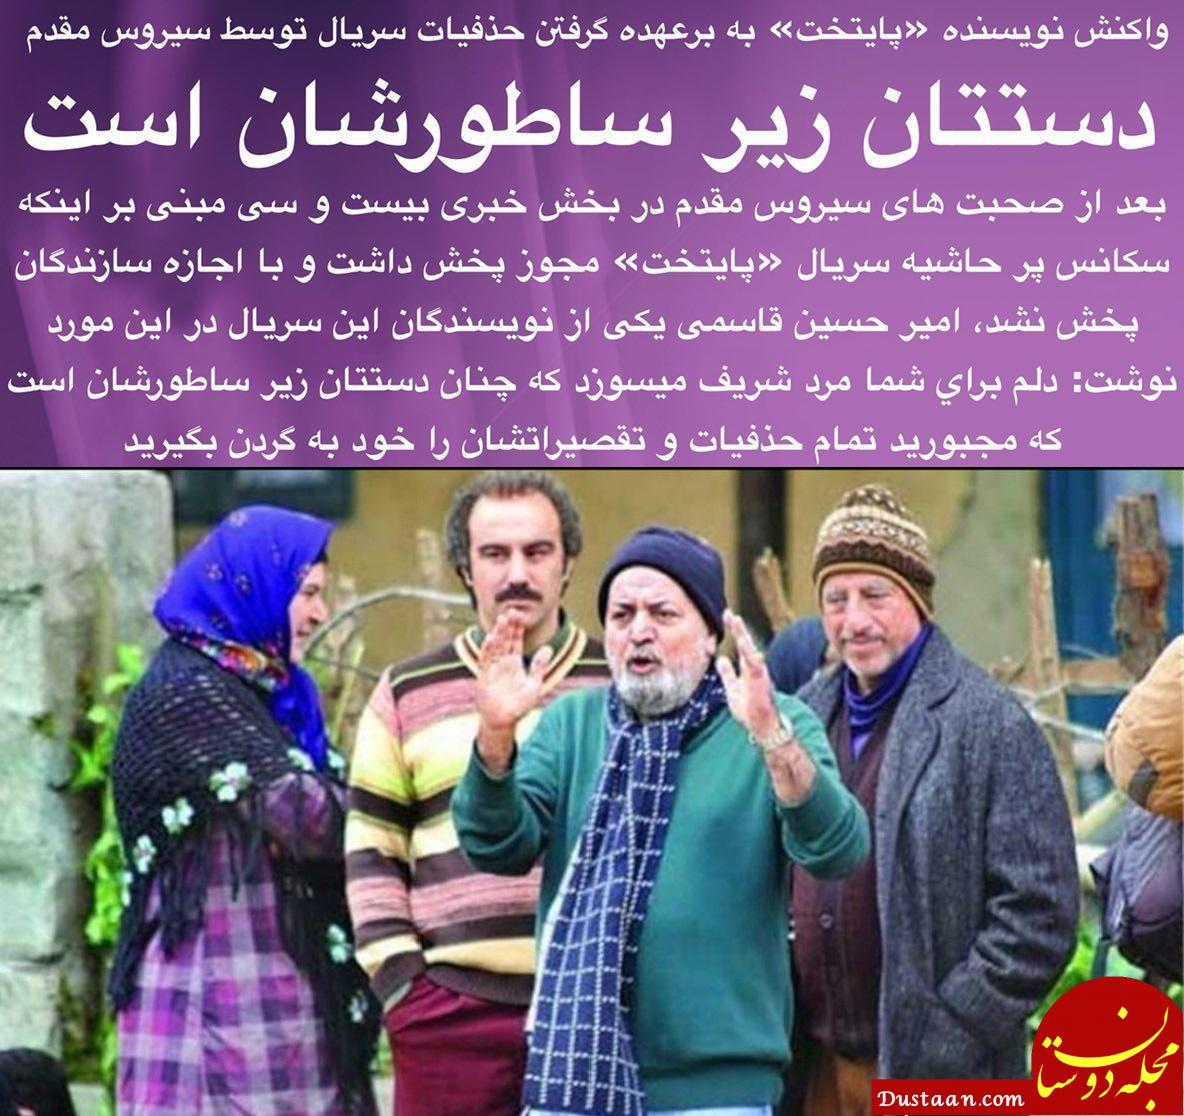 www.dustaan.com واکنش نویسنده «پایتخت» به صحبت های سیروس مقدم/ دستتان زیر ساطورشان است!